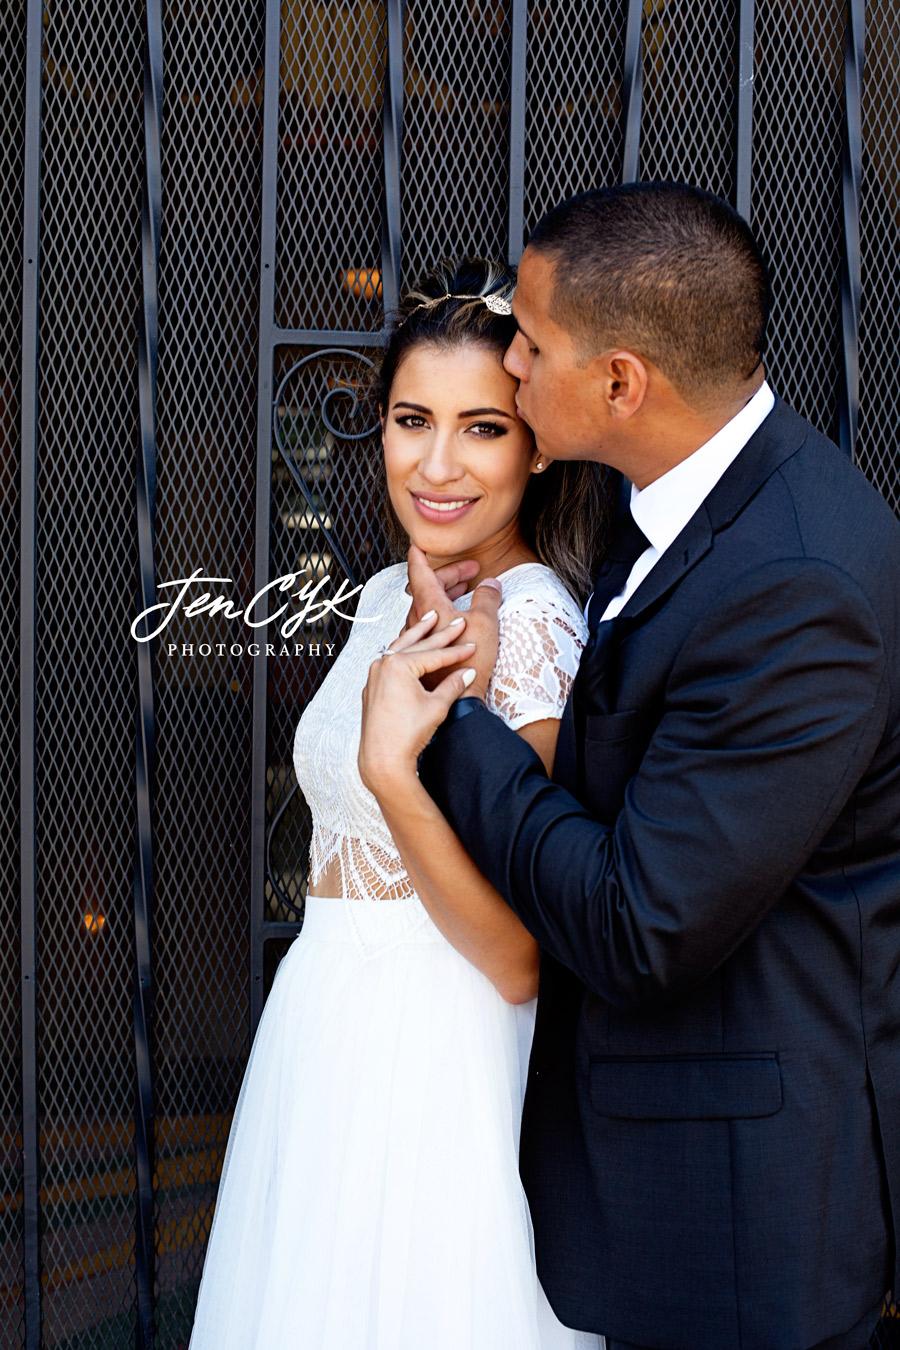 Santa Ana Courthouse Weddings (4)